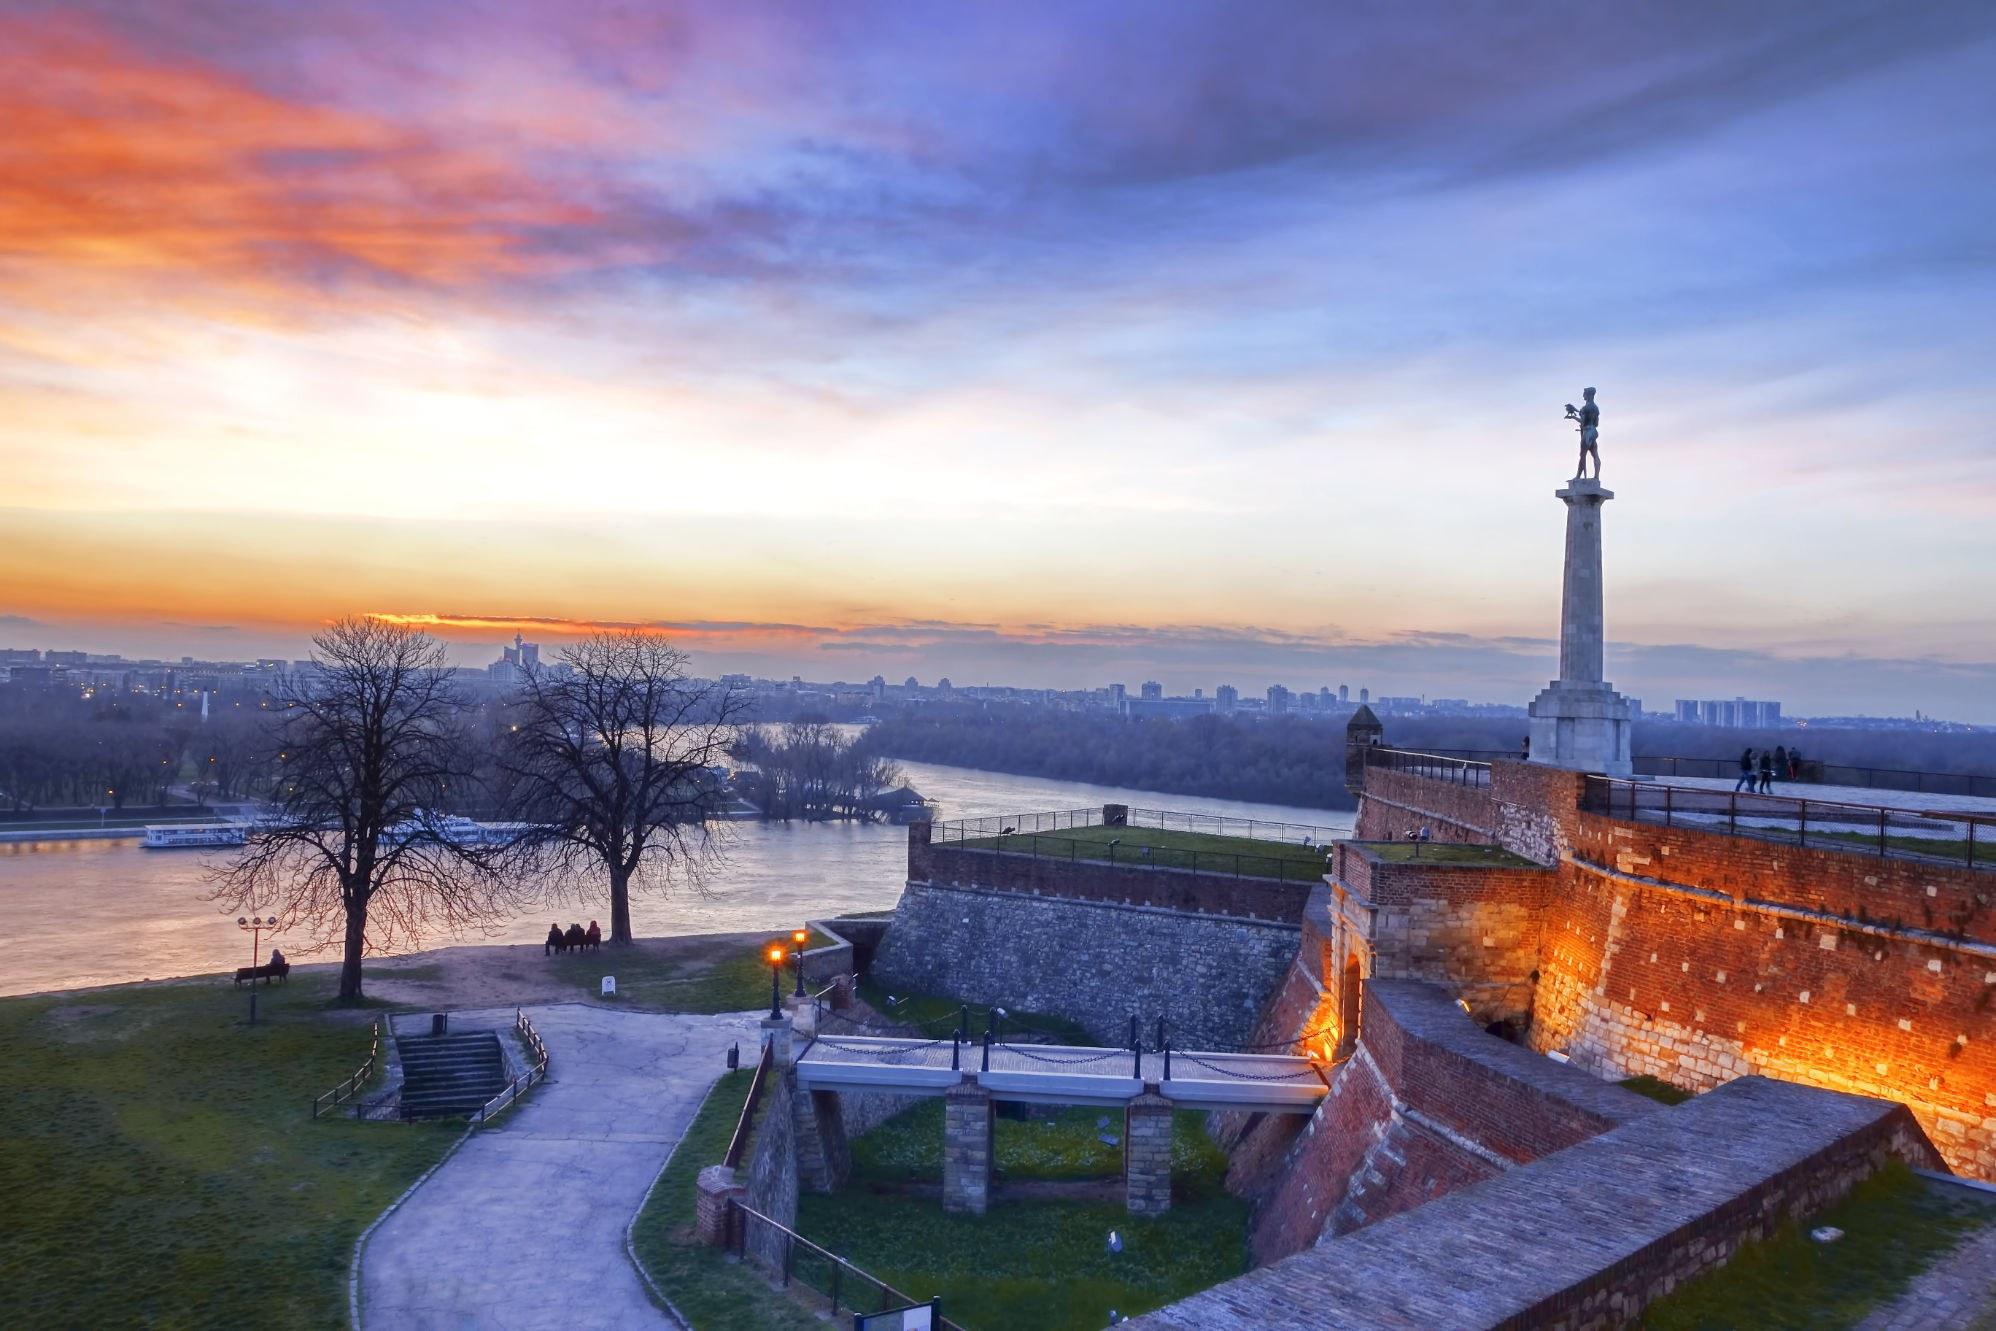 Belgrade sunset image